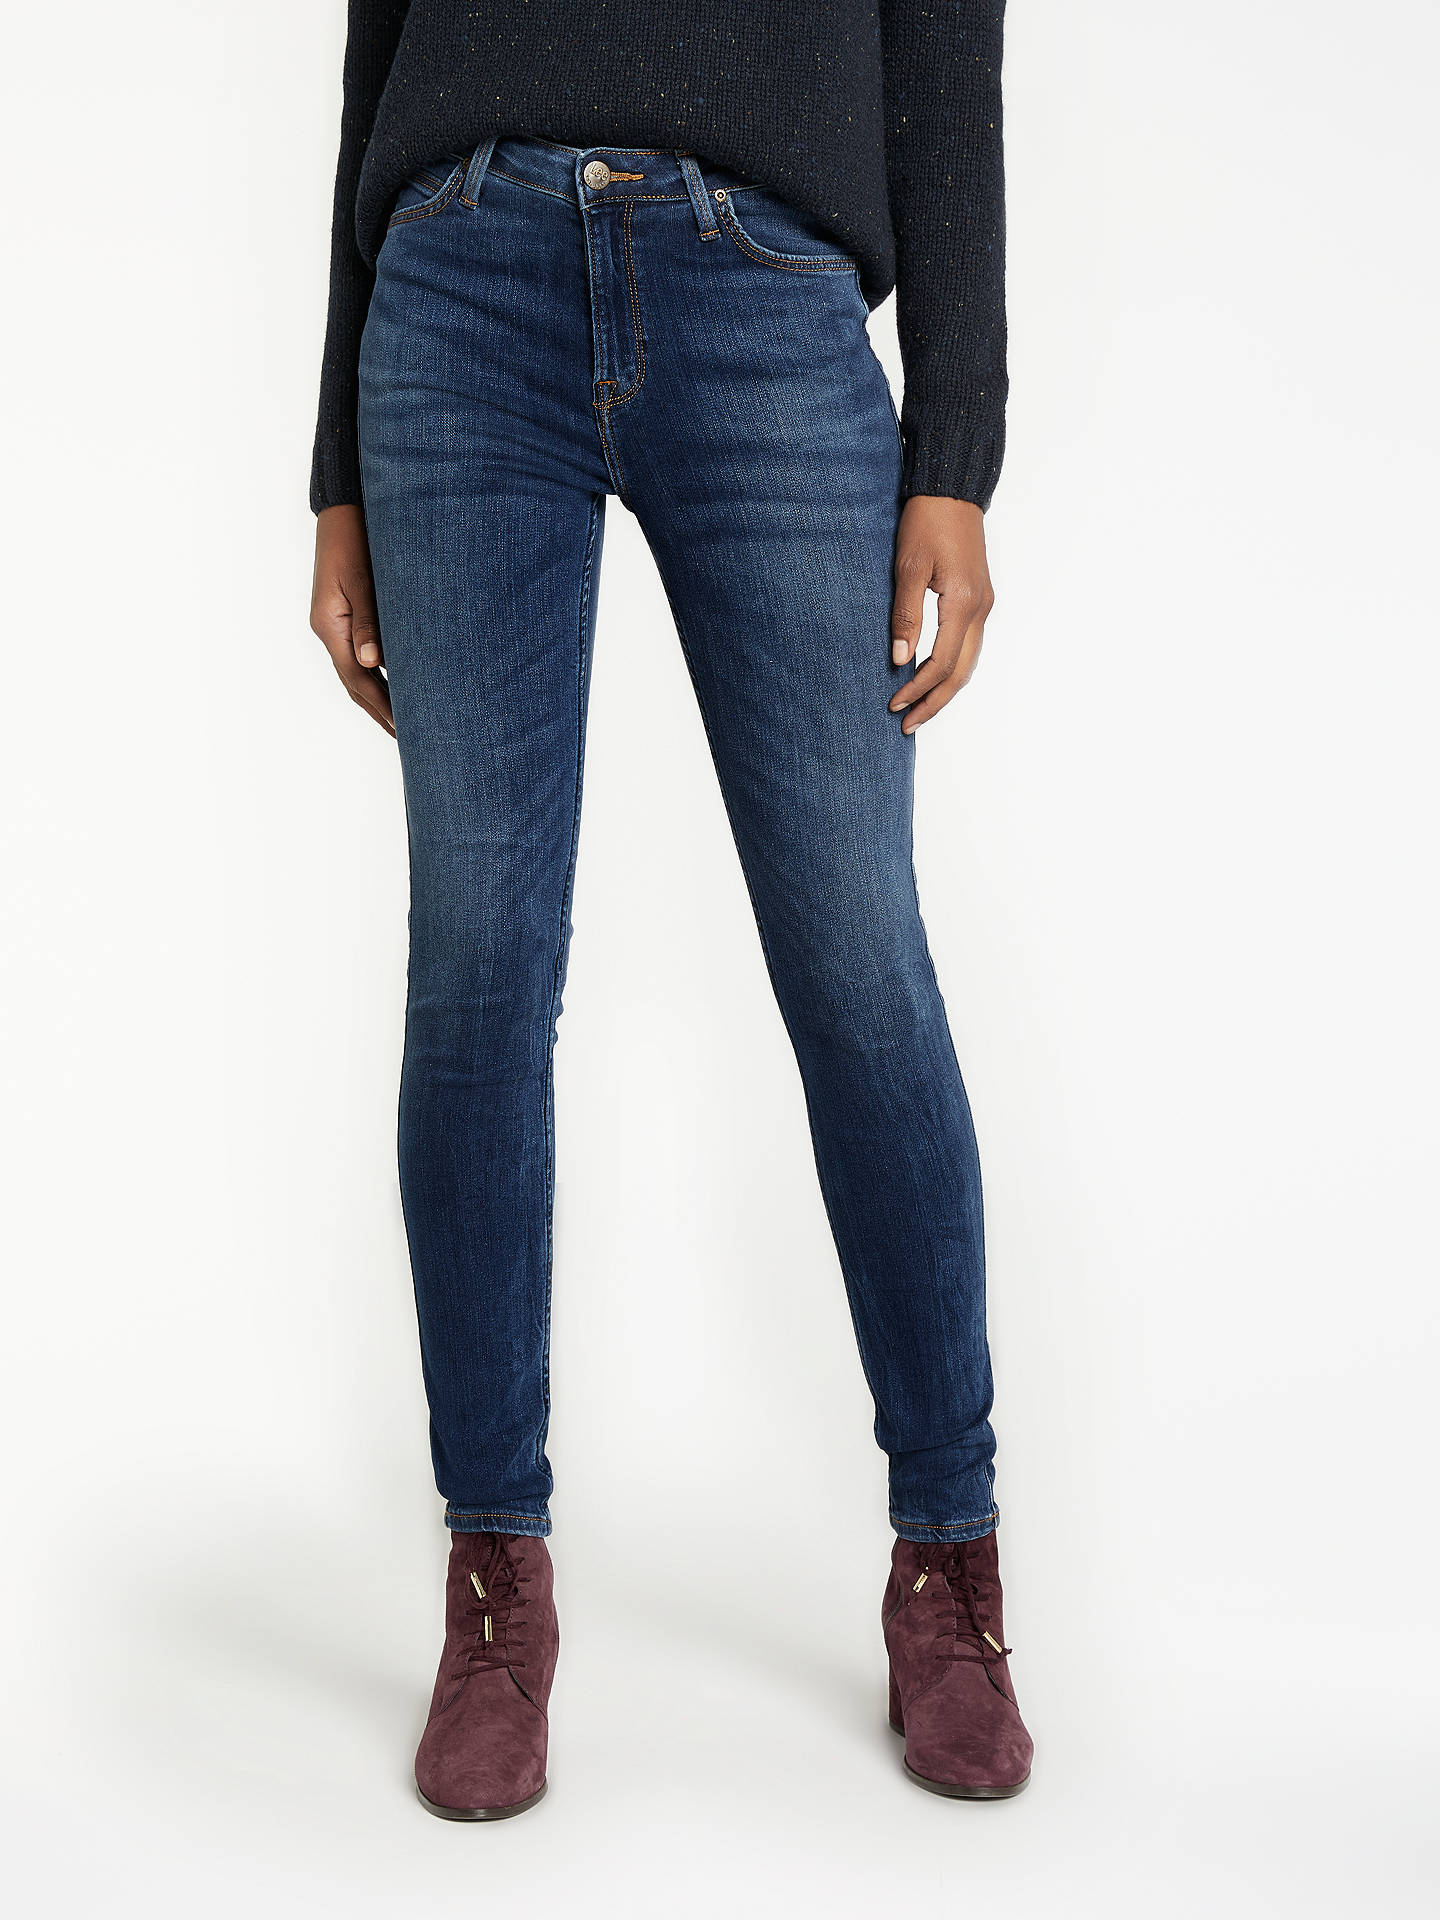 e887fcf8 Buy Lee Scarlett High Waist Skinny Jeans, Yankee Blue, W27/L31 Online at ...